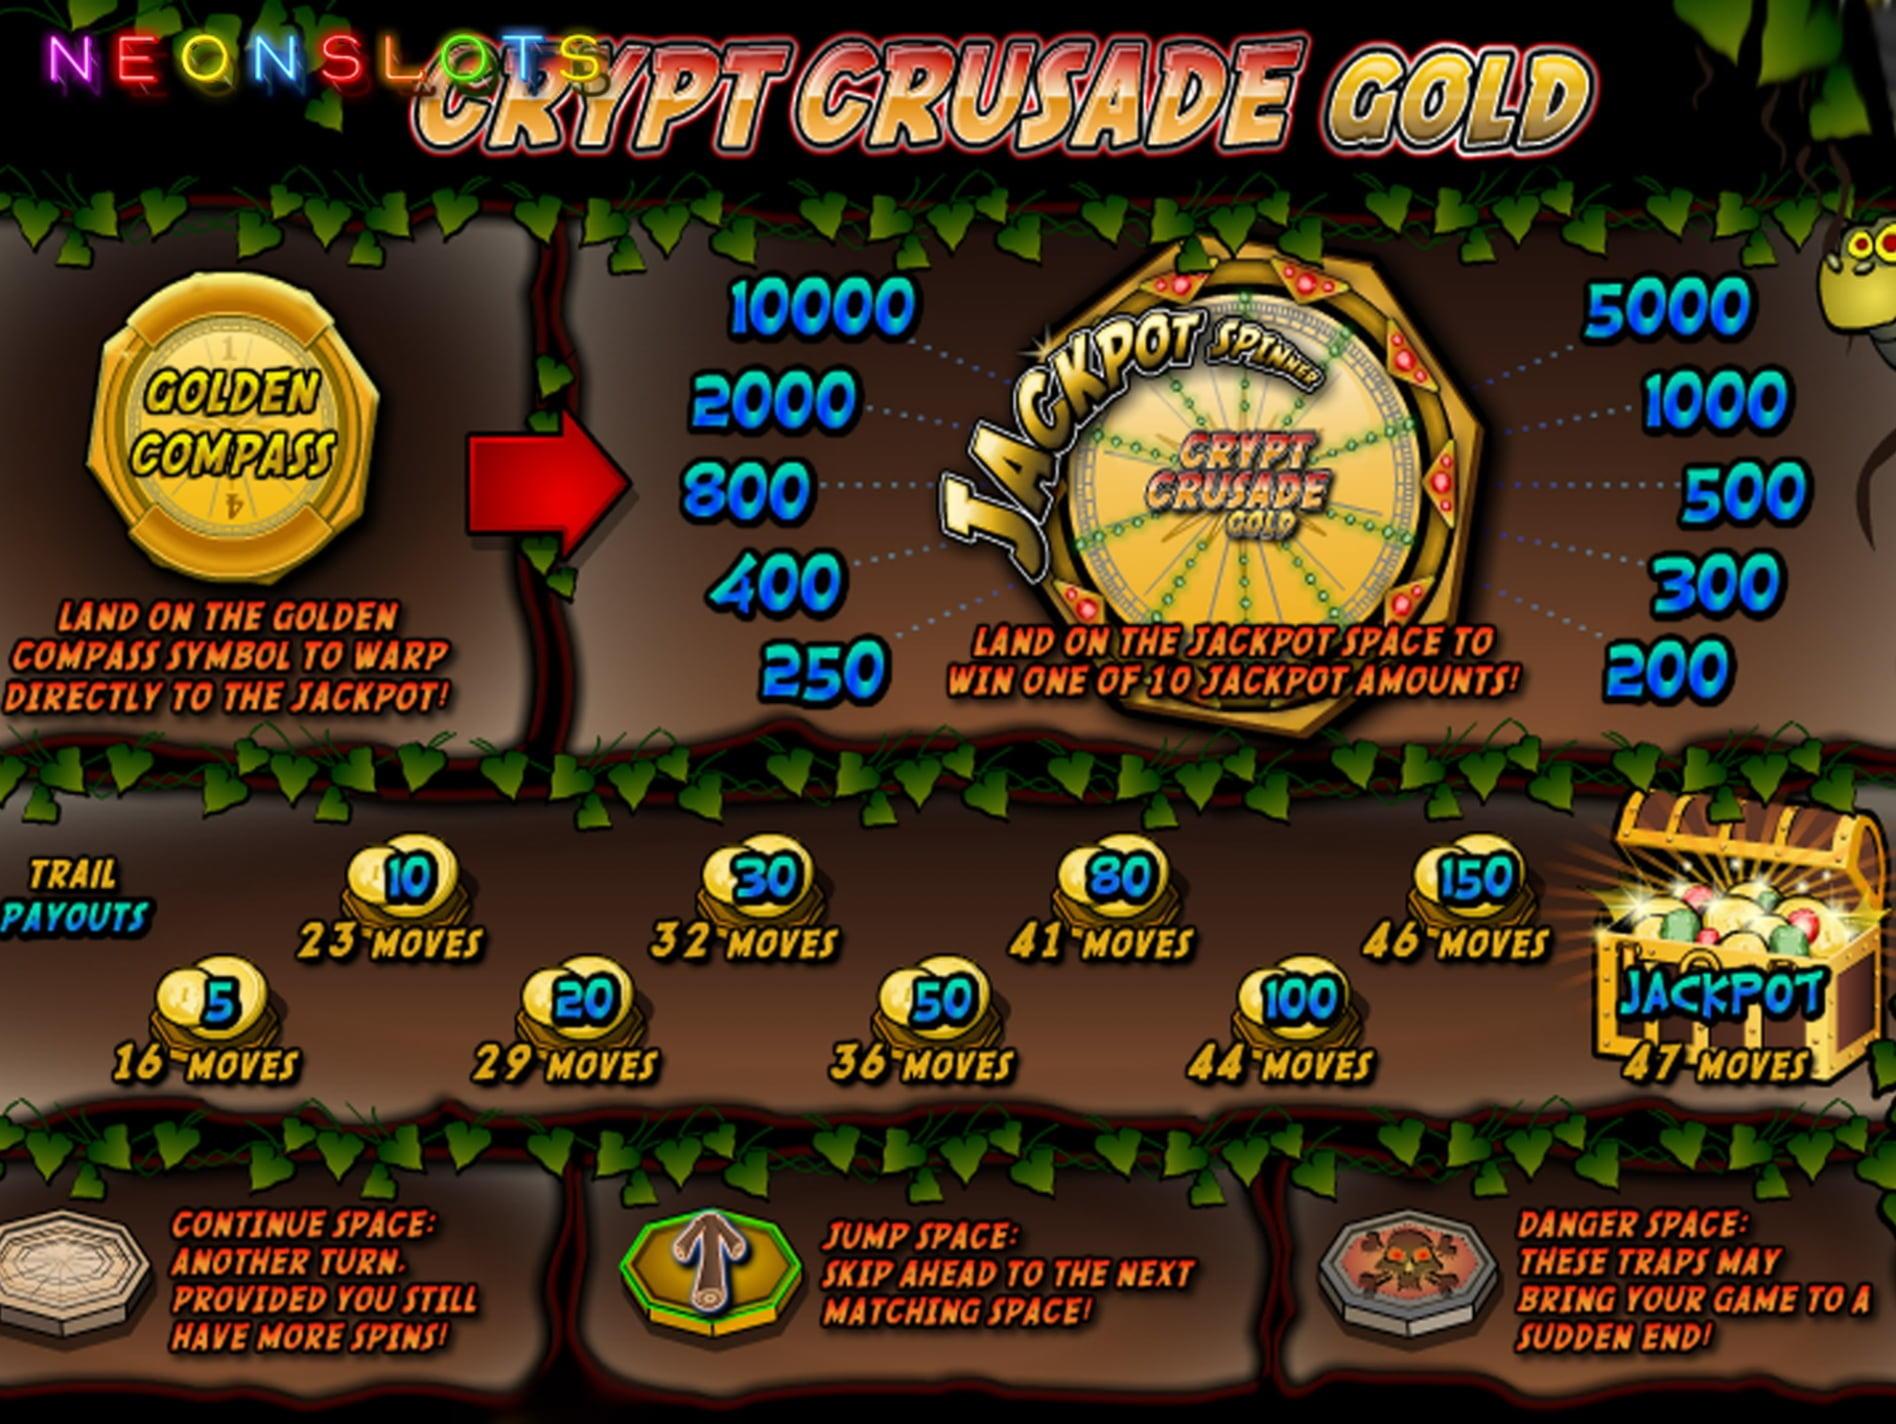 EURO 3445 Treasure Island Jackpots-тегі депозиттік казино бонусы жоқ (Sloto Cash Mirror)